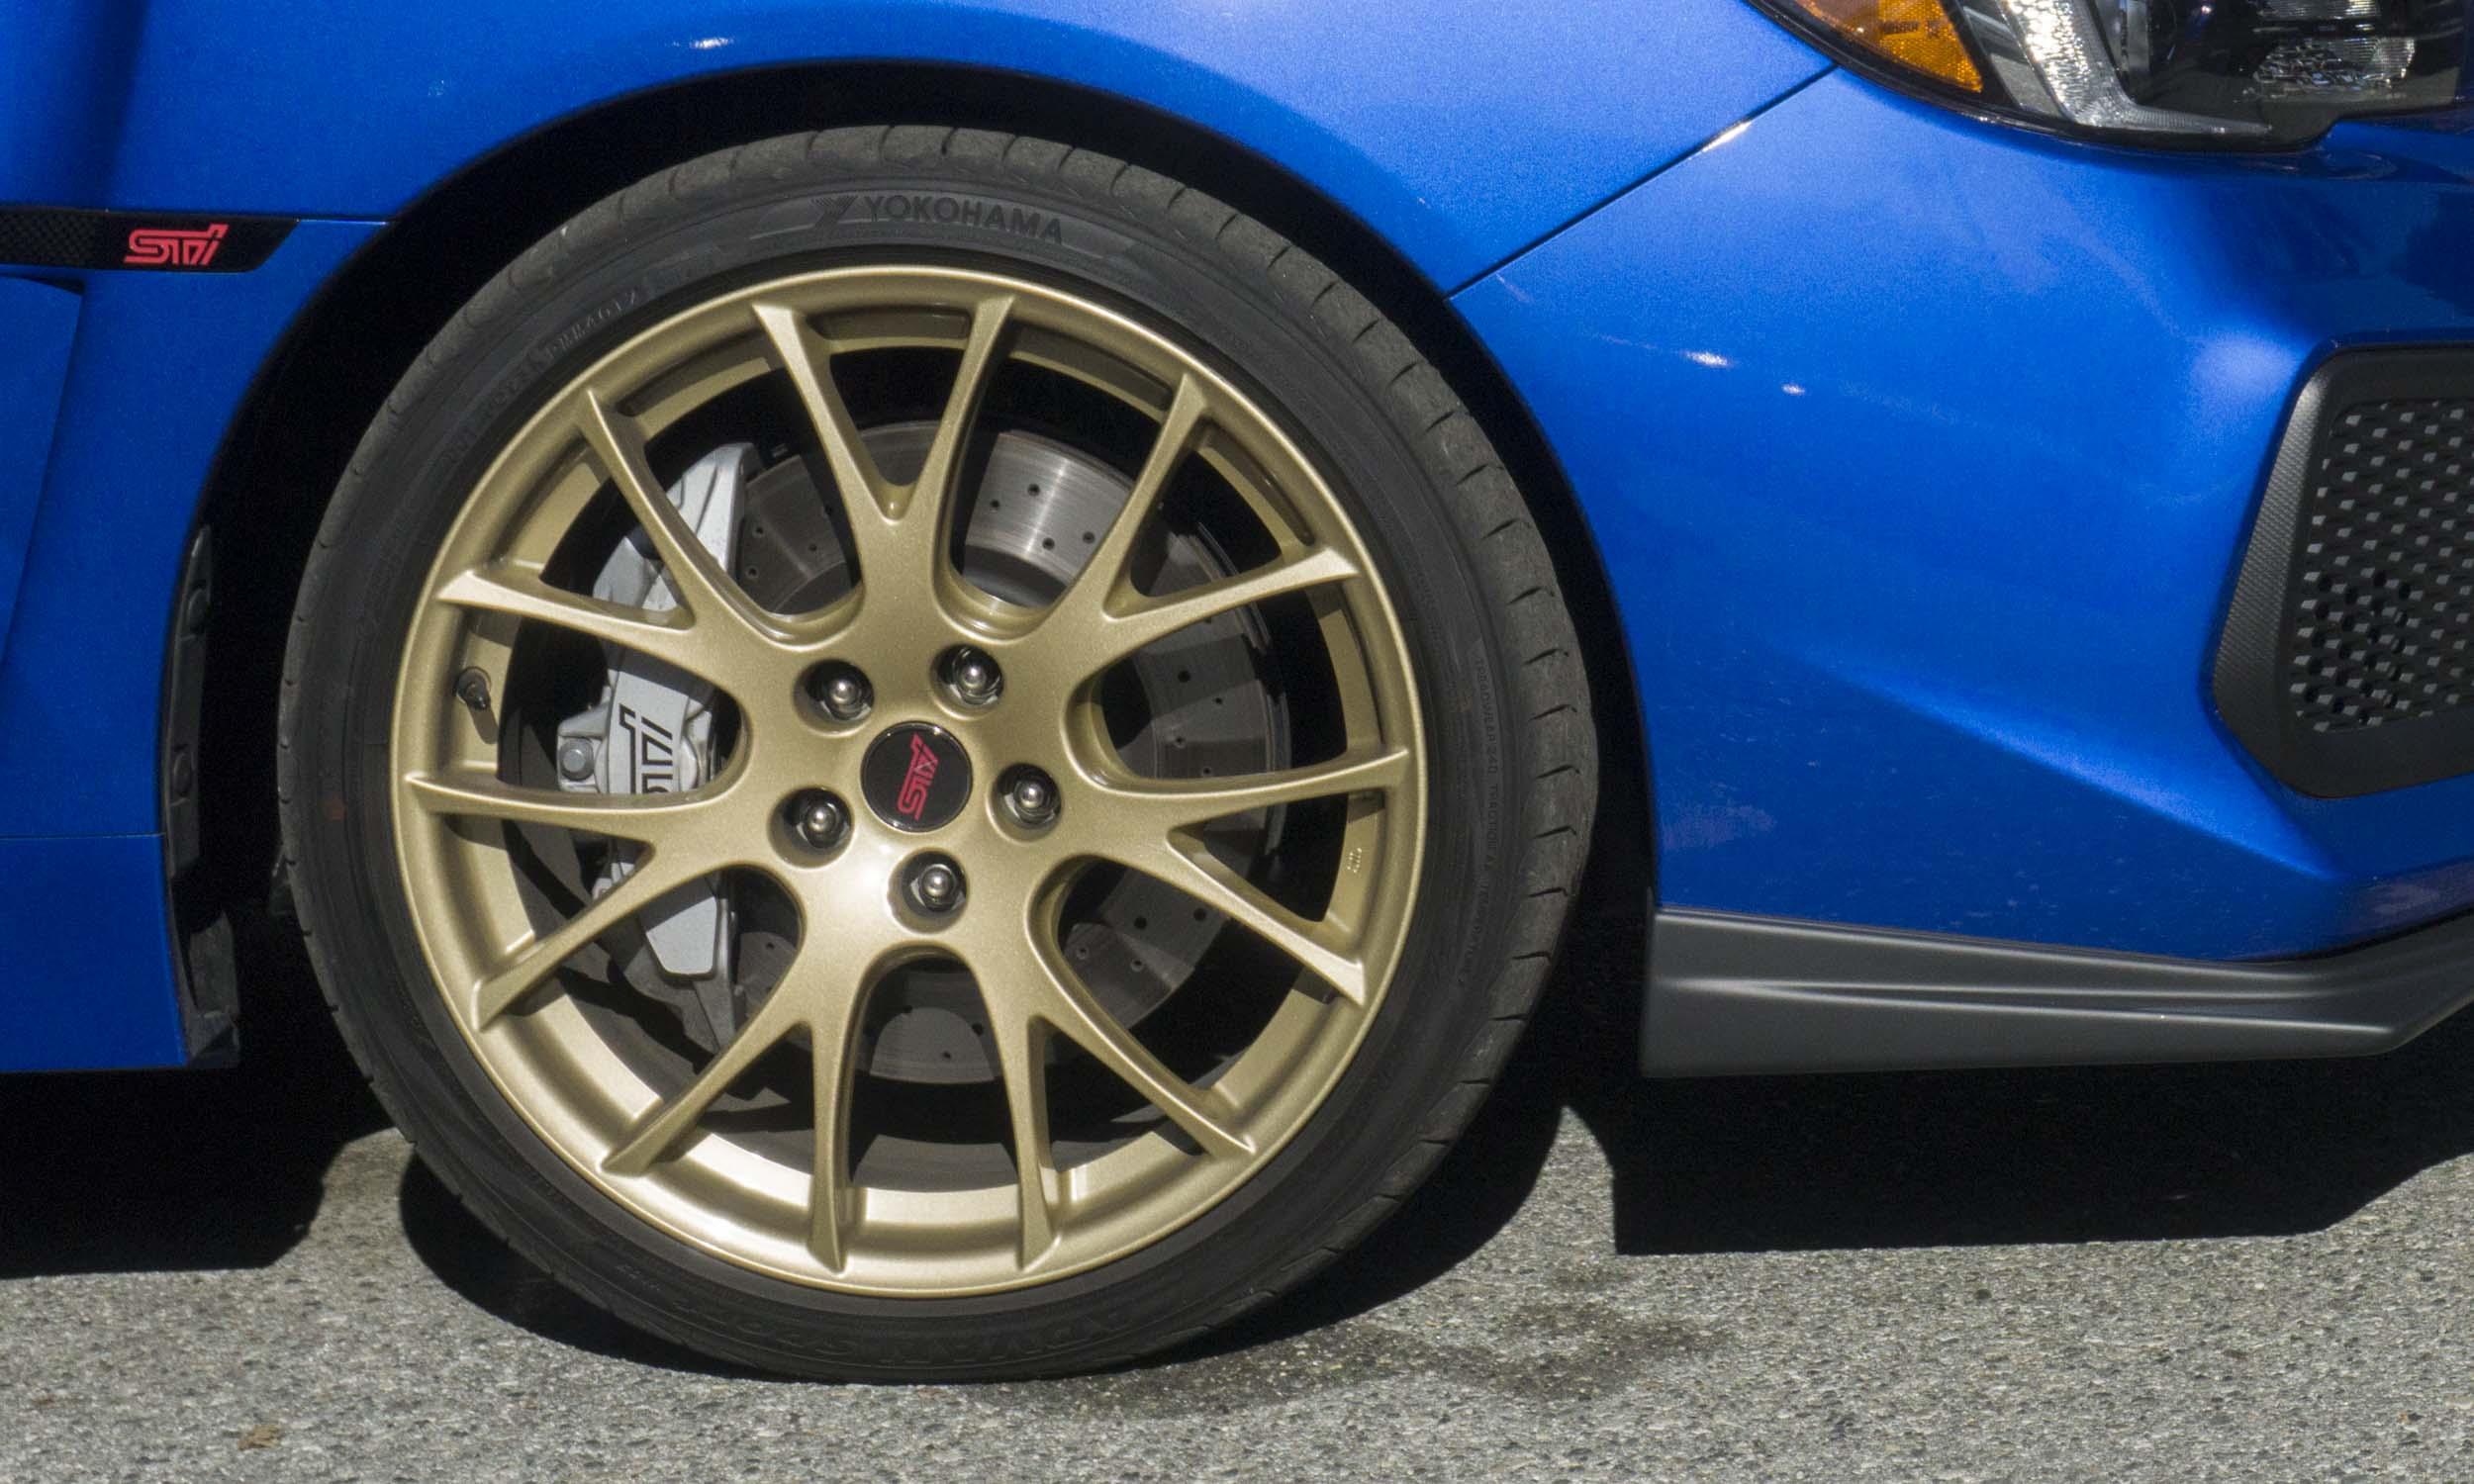 2018 Subaru Wrx Sti Type Ra First Drive Review 187 Autonxt